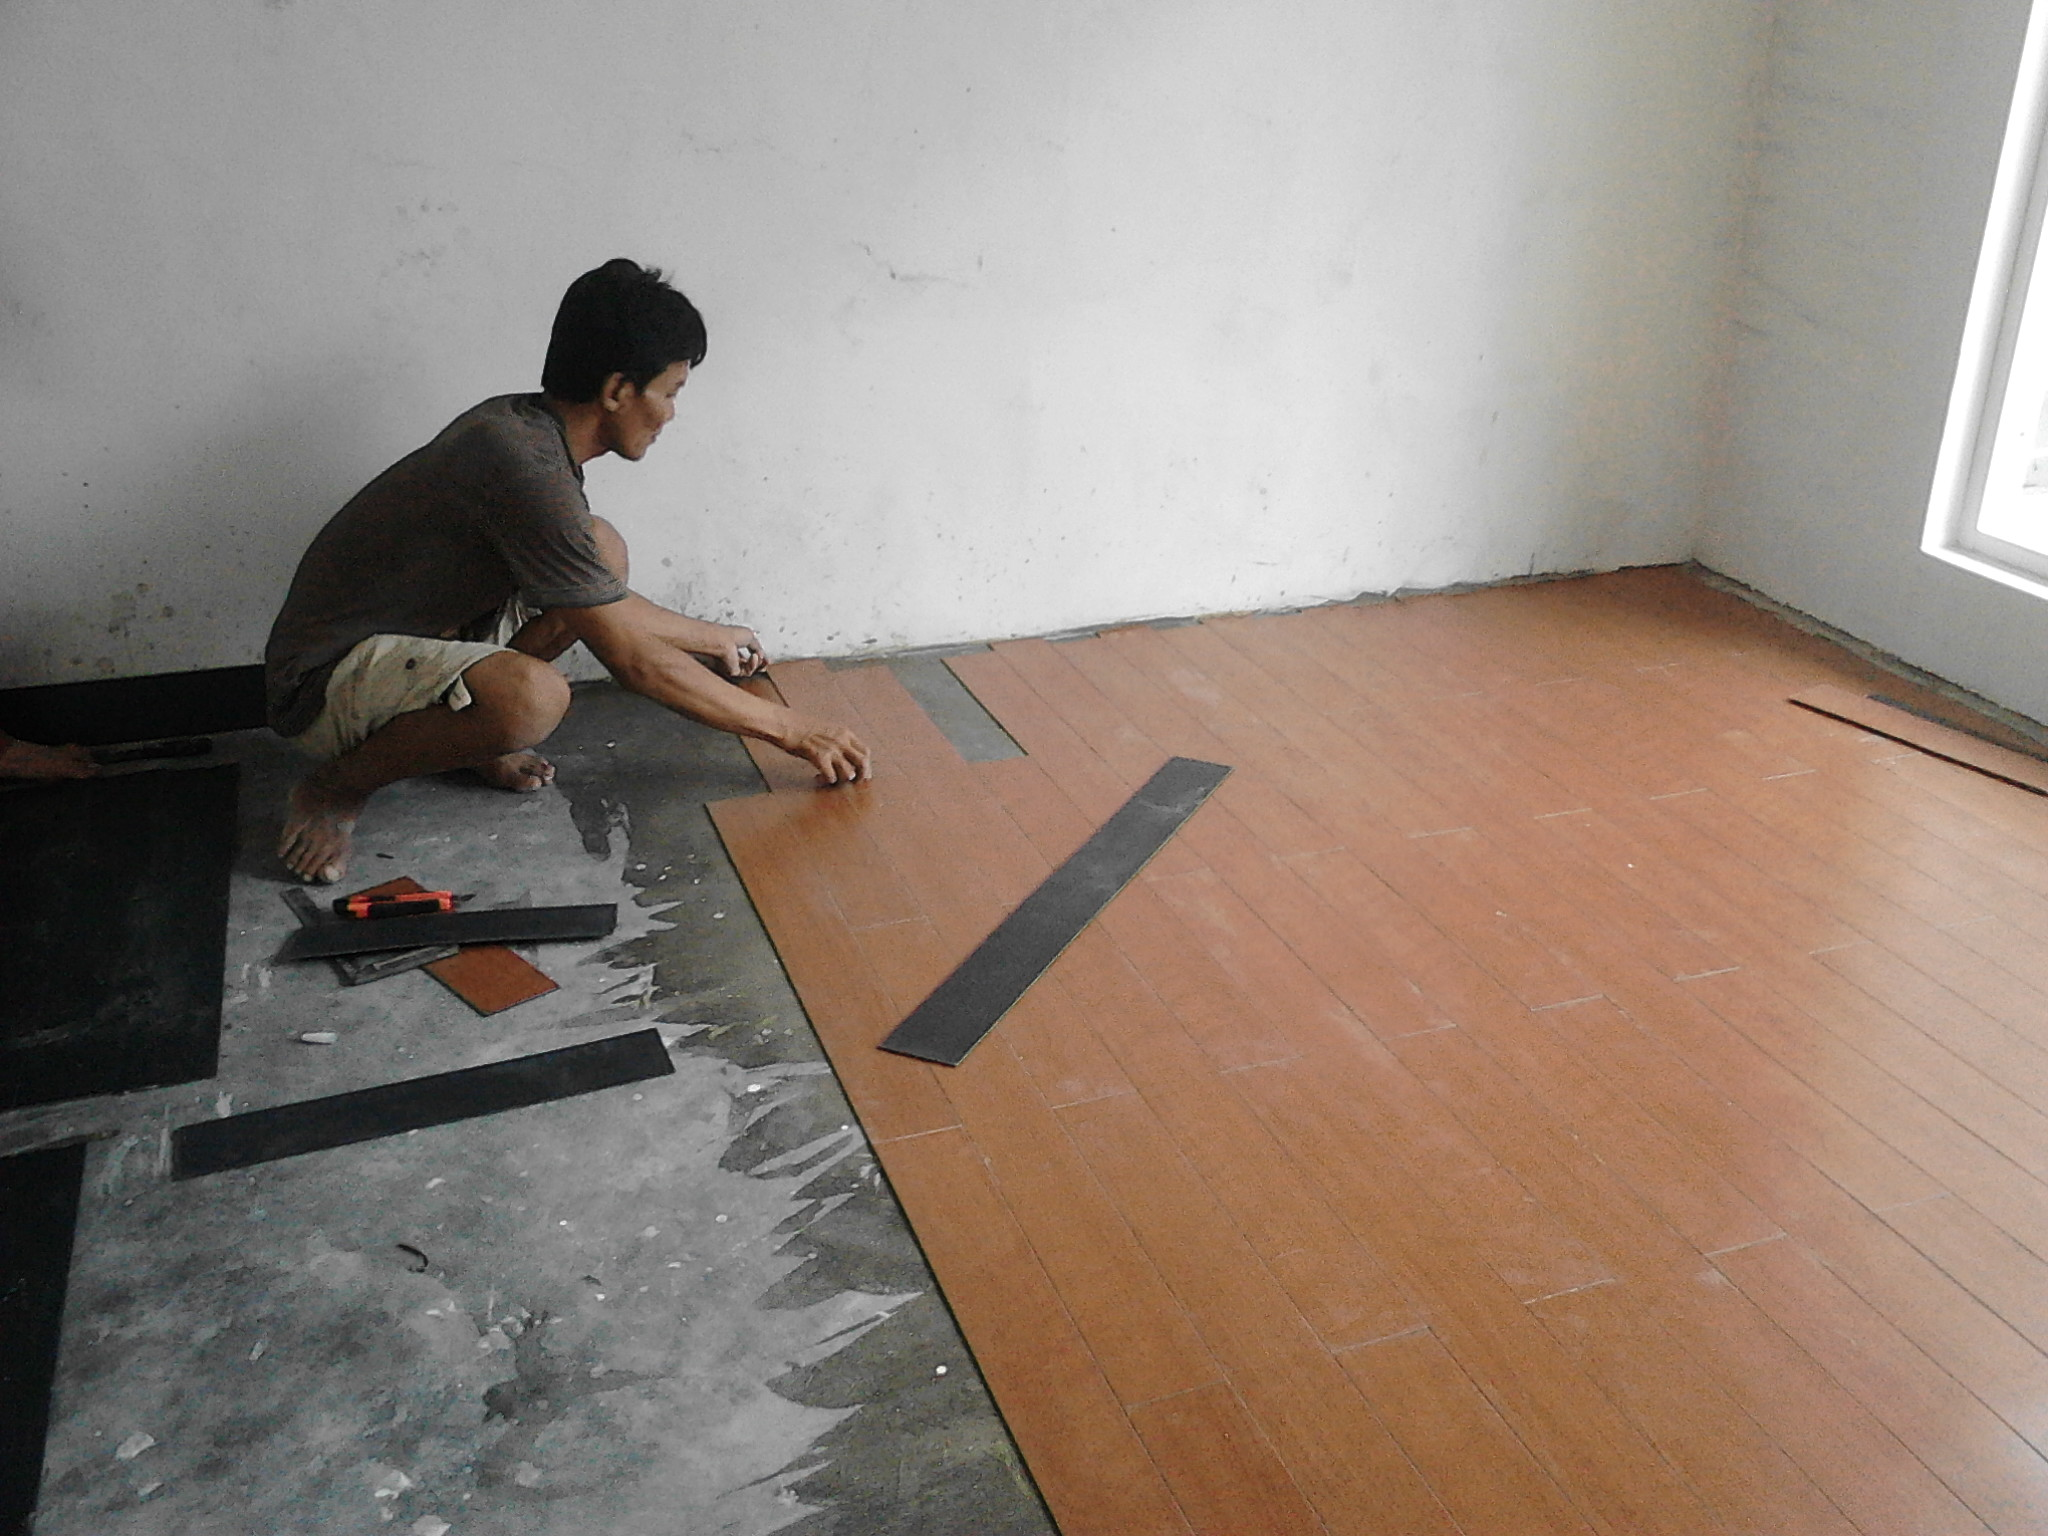 i.pinimg.com